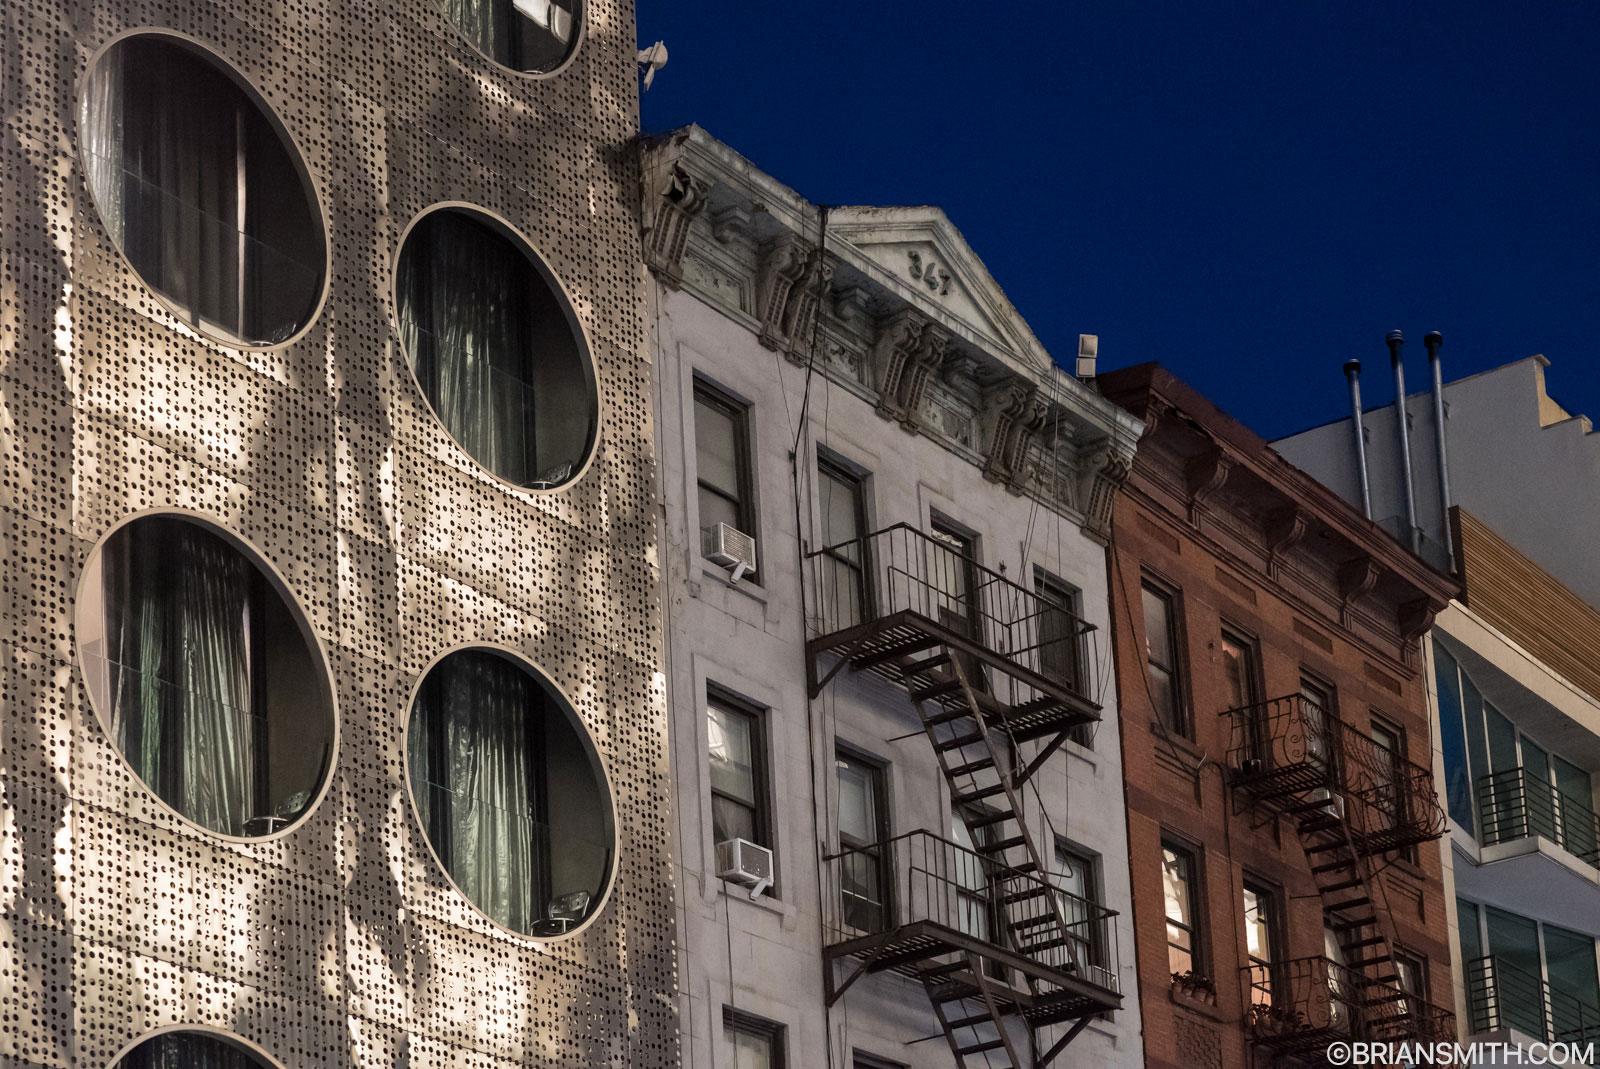 Sony a7S II night in New York